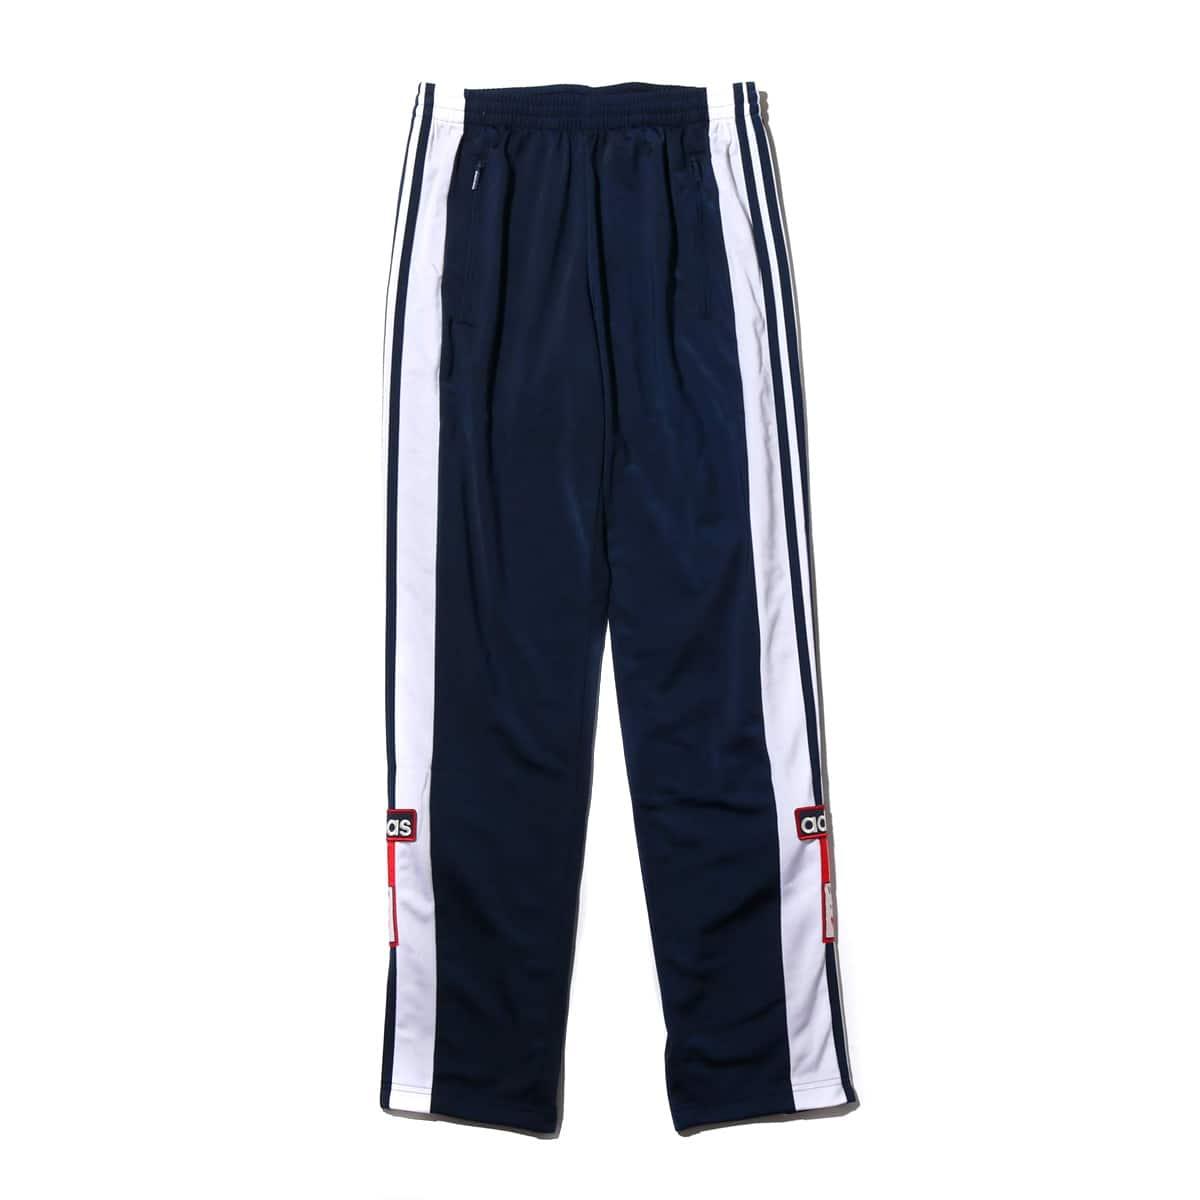 adidas Originals ADIBREAK OG TRACK PANTS COLLEGE NAVY 18FW-I_photo_large